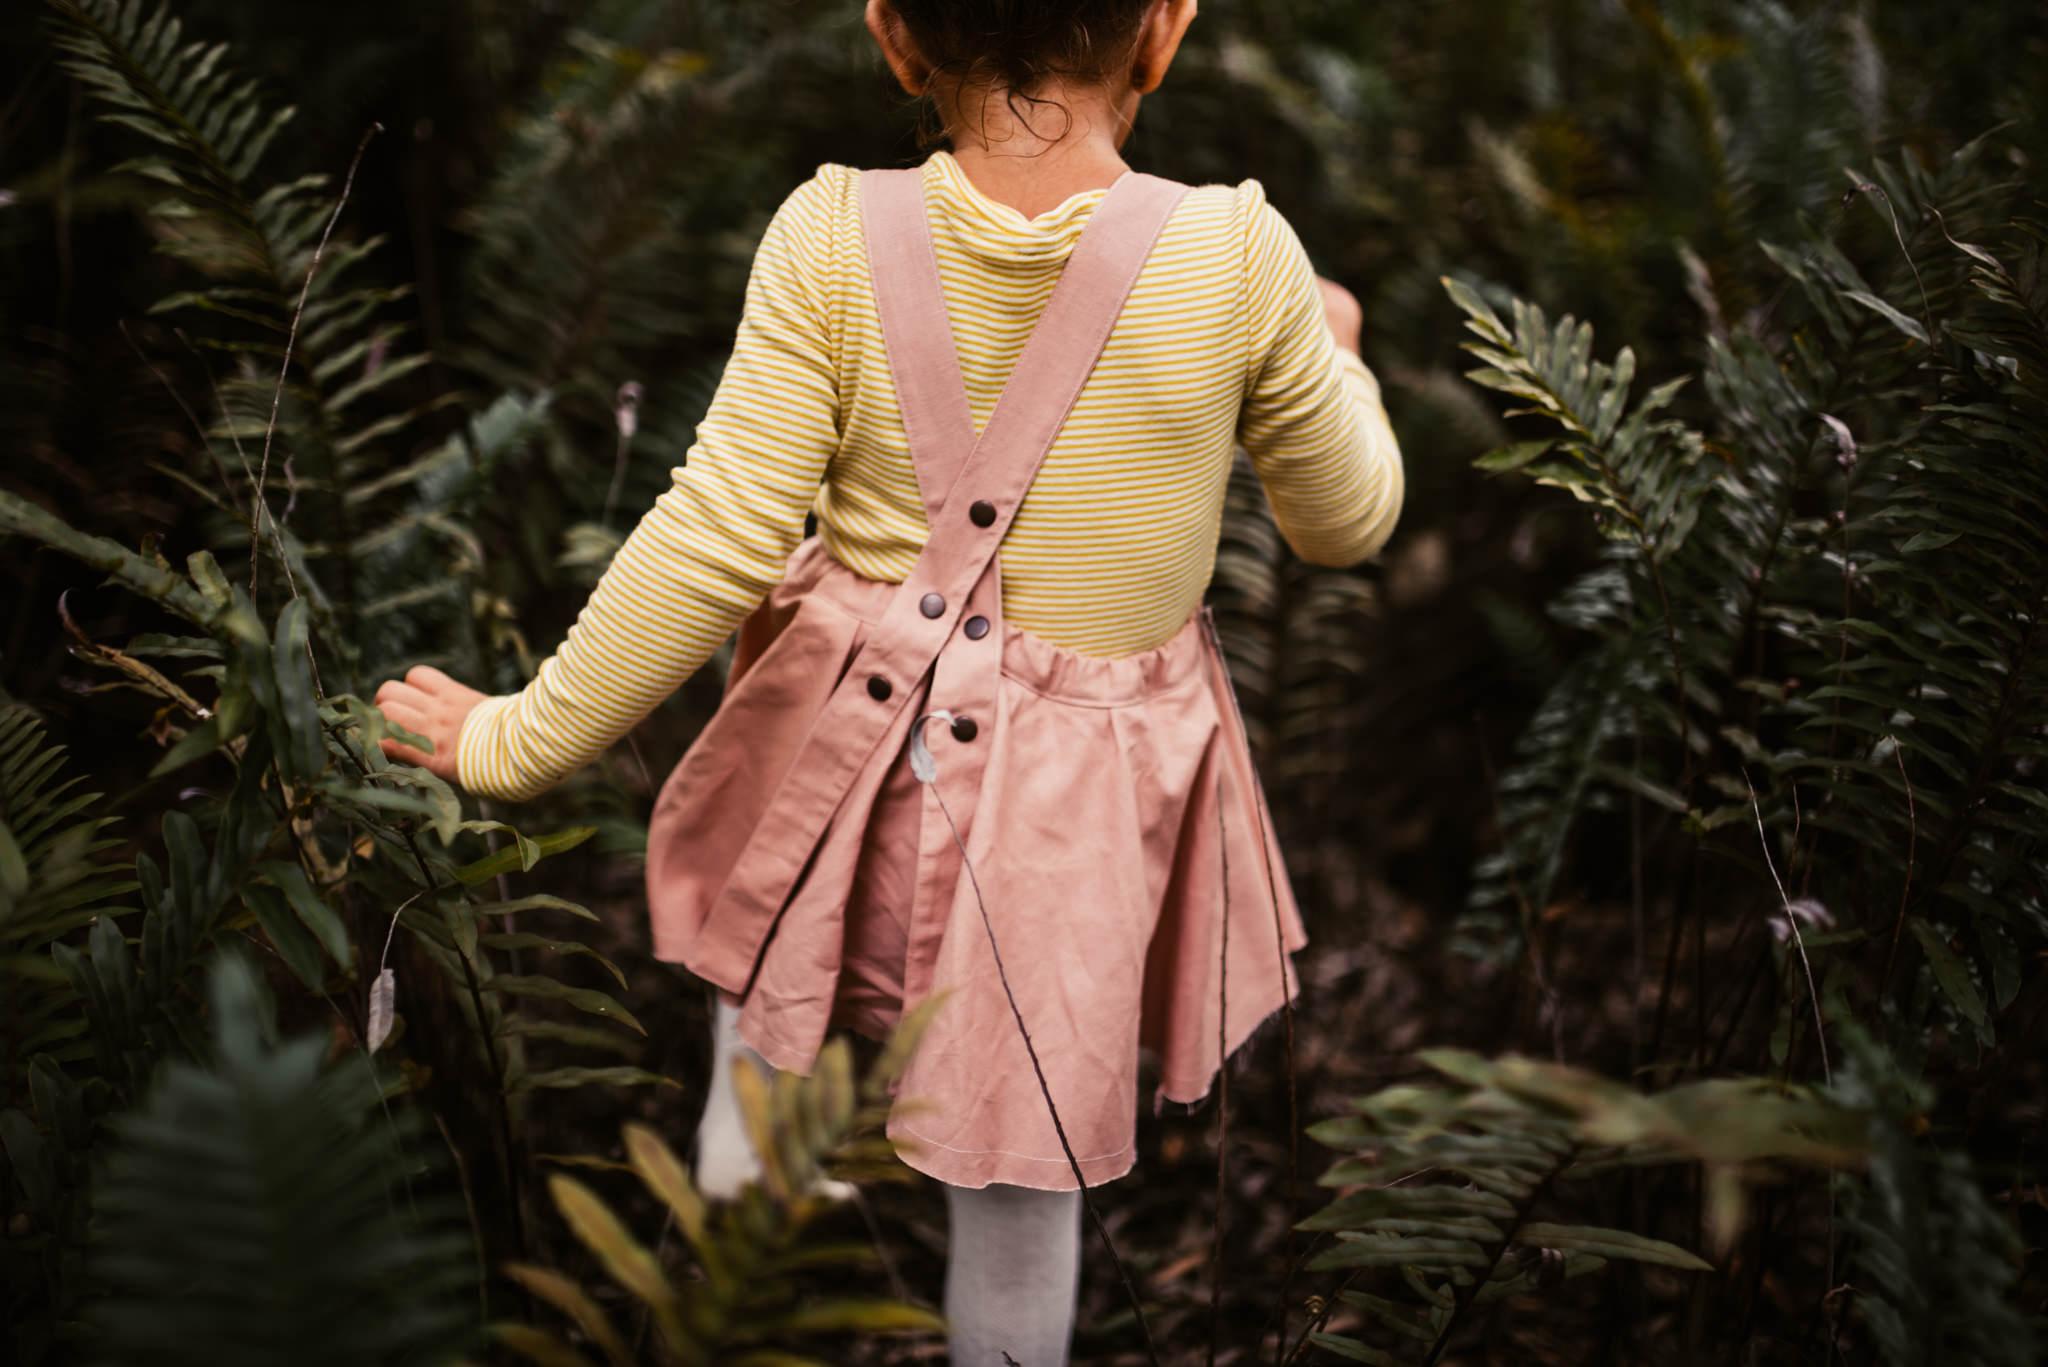 twyla jones photography - treasure coast florida - childrens adventure clothing commercial shoot--23.jpg